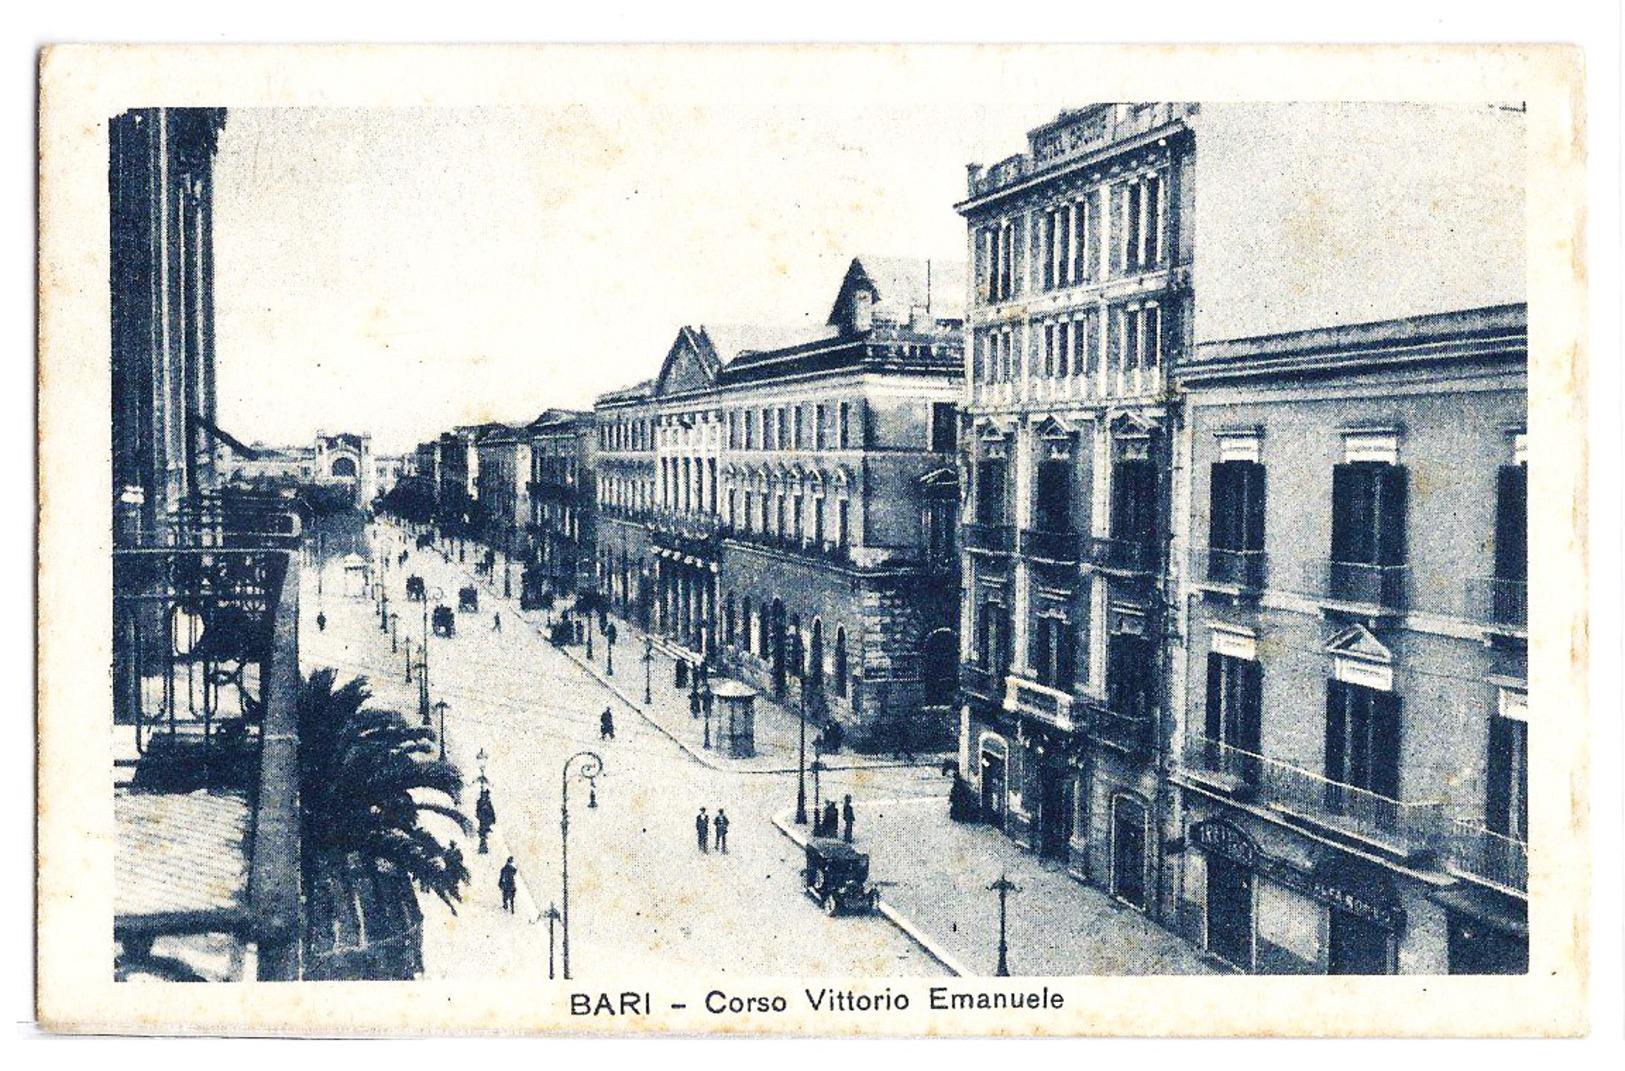 Bari - Corso Vittorio Emanuele. 1930 - Bari